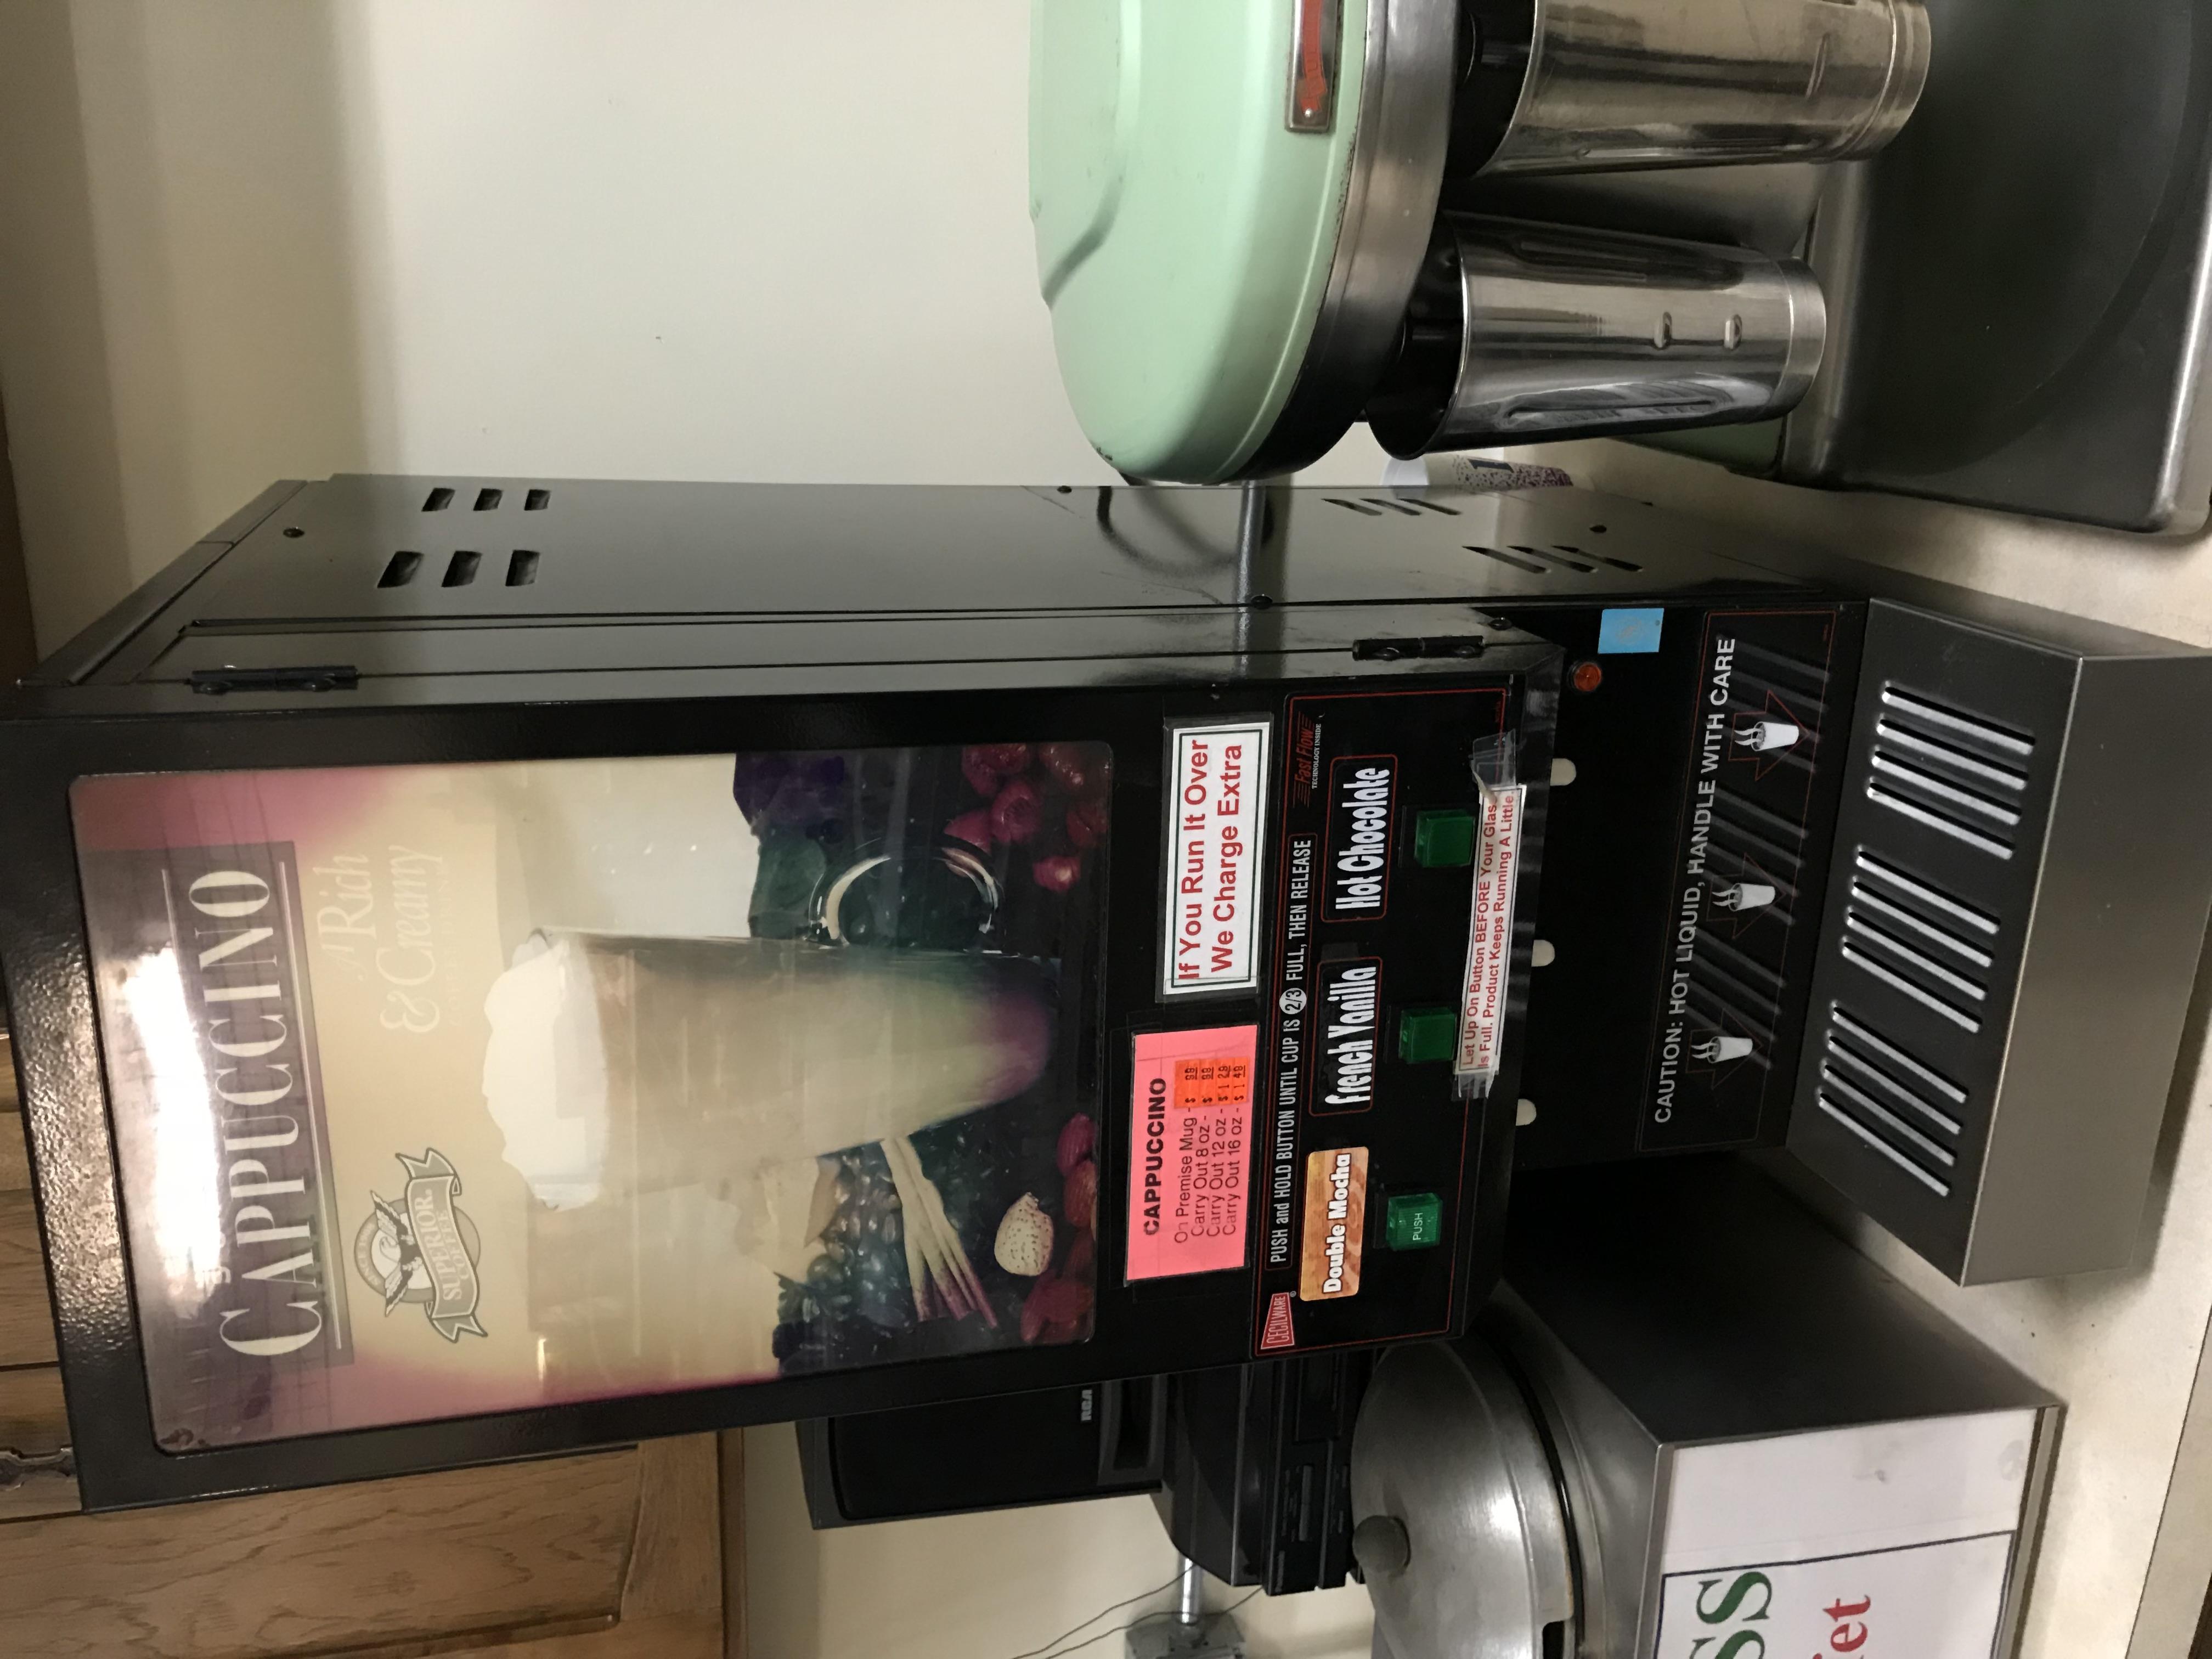 Cecelware-Cappuccino-Machine.jpg